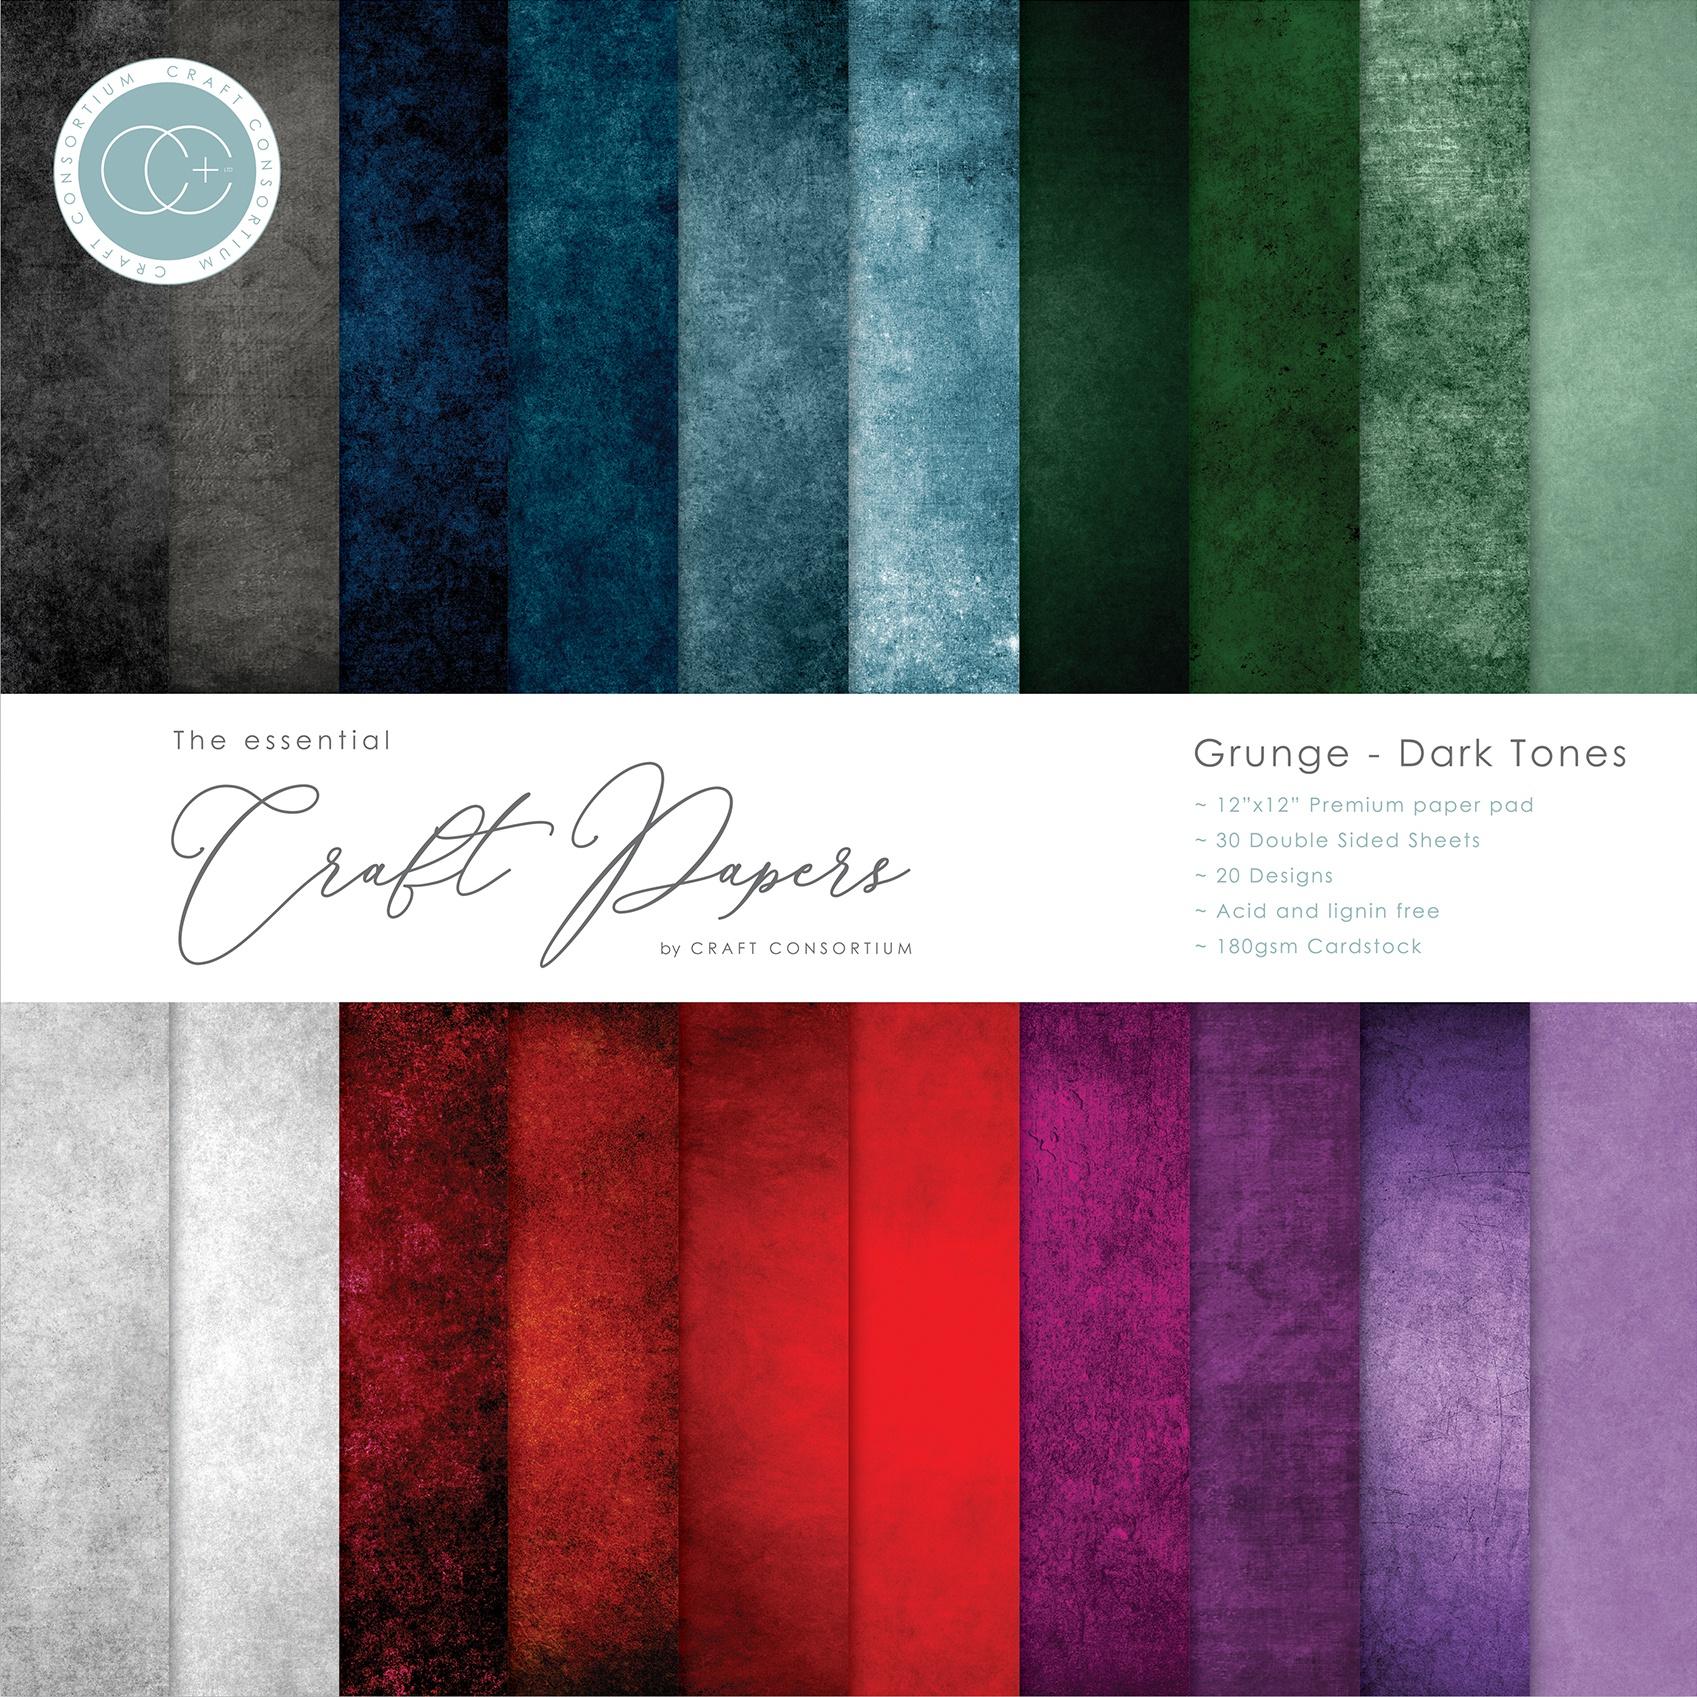 Craft Consortium Double-Sided Paper Pad 12X12 30/Pkg-Grunge-Dark Tones, 20 Des...